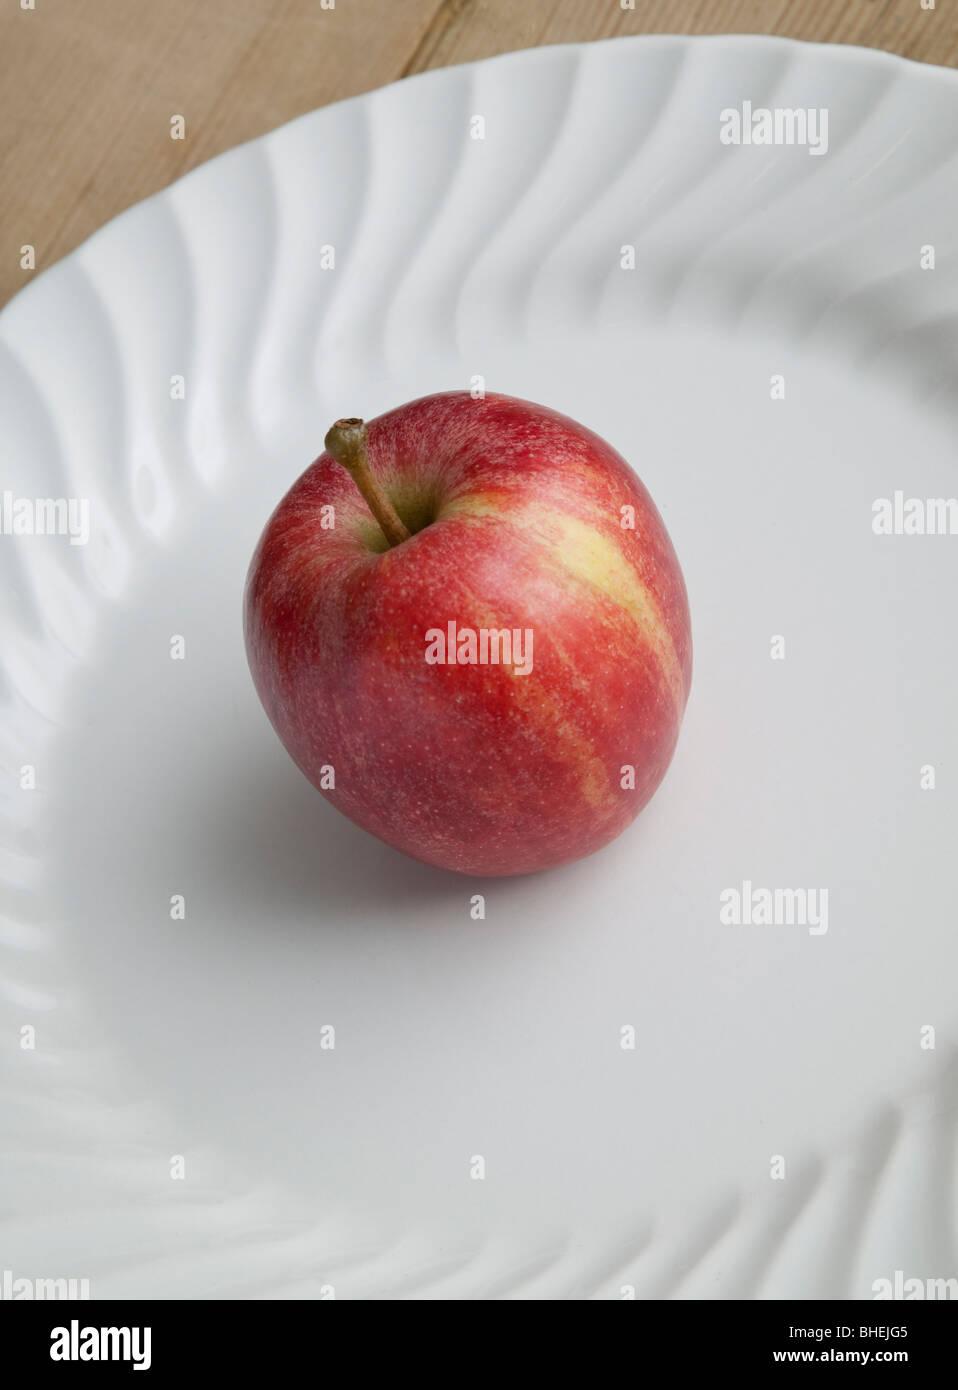 Comer manzana roja sobre placa blanca sobre la mesa de madera Imagen De Stock